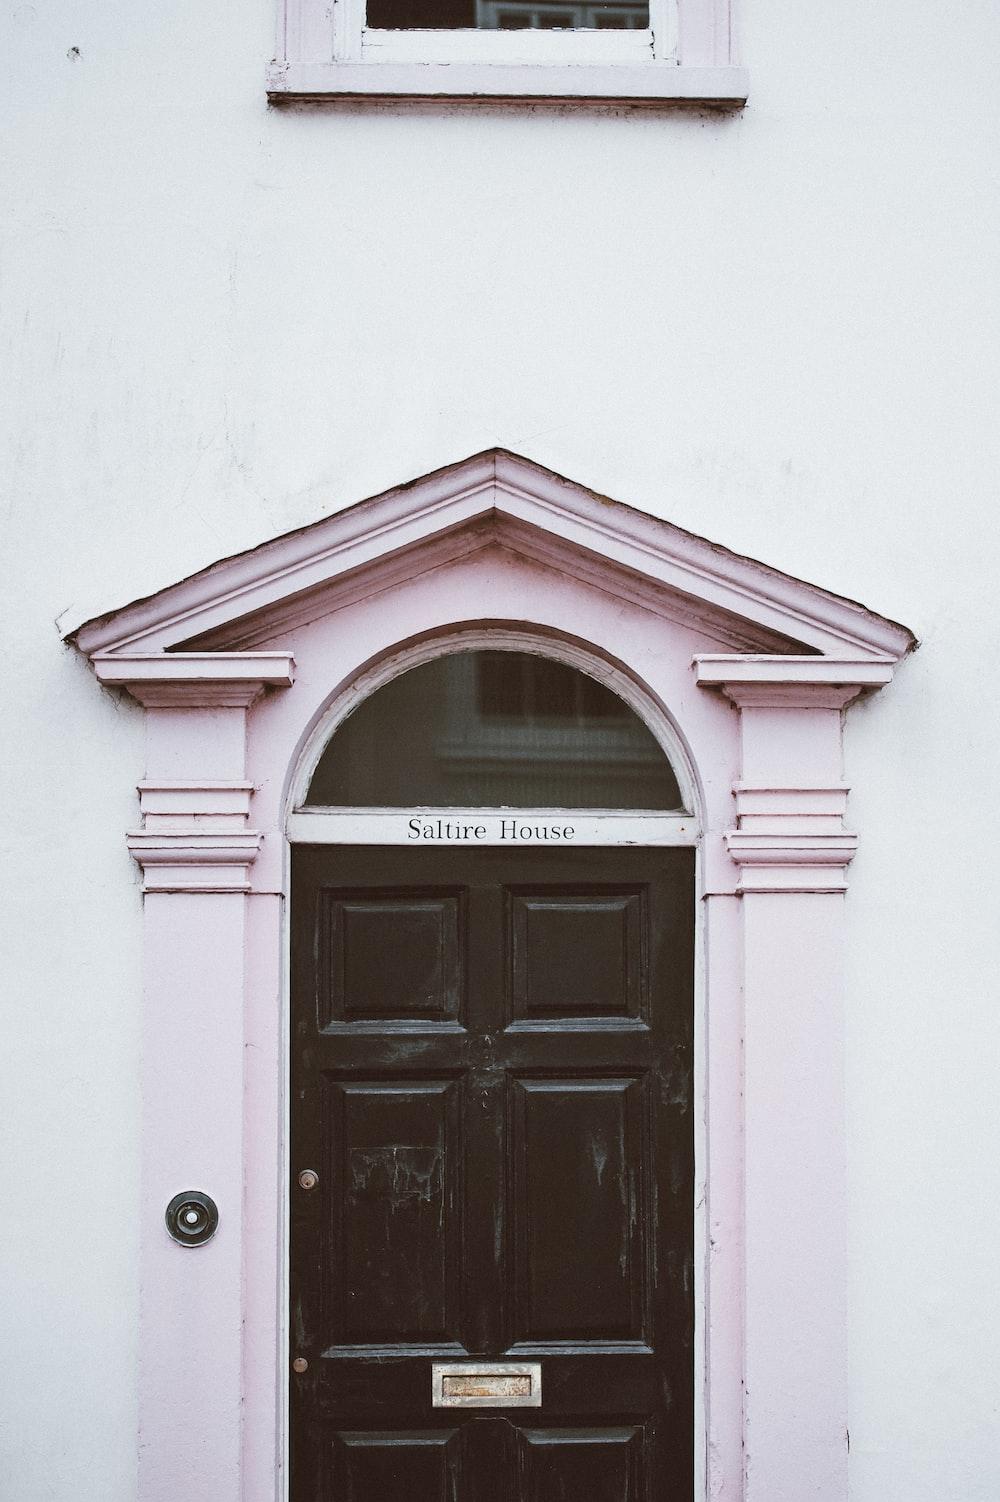 Saltire House signage